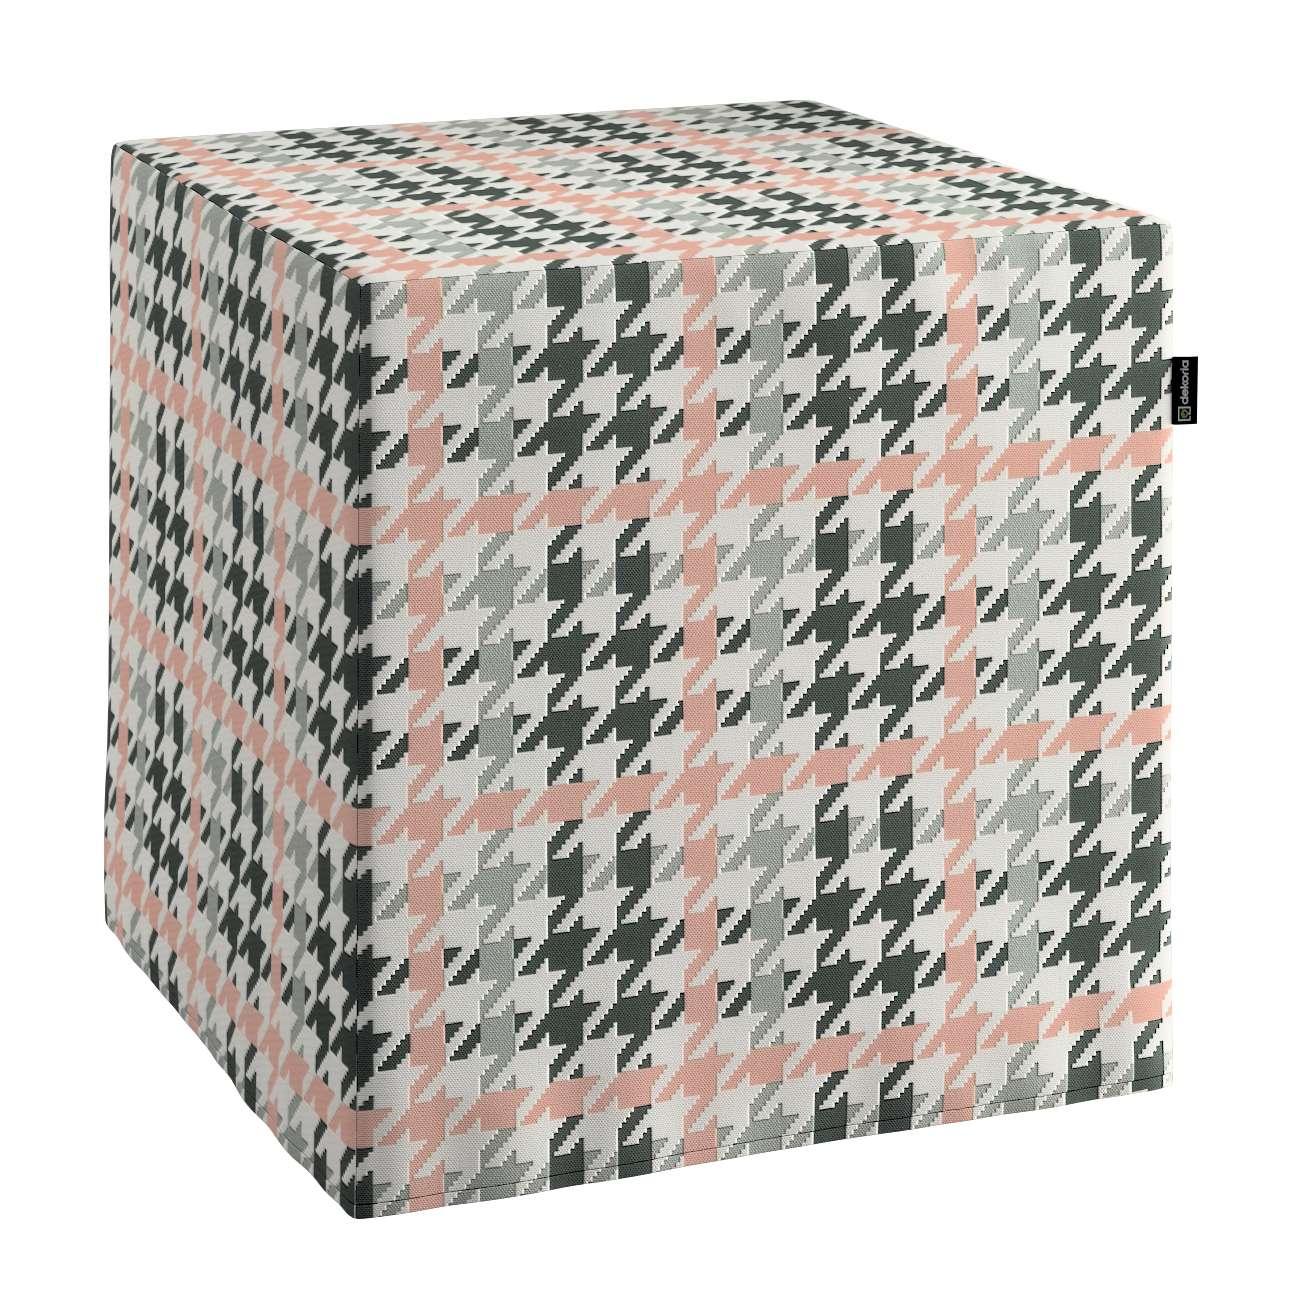 Sedák Cube - kostka pevná 40x40x40 v kolekci Brooklyn, látka: 137-75